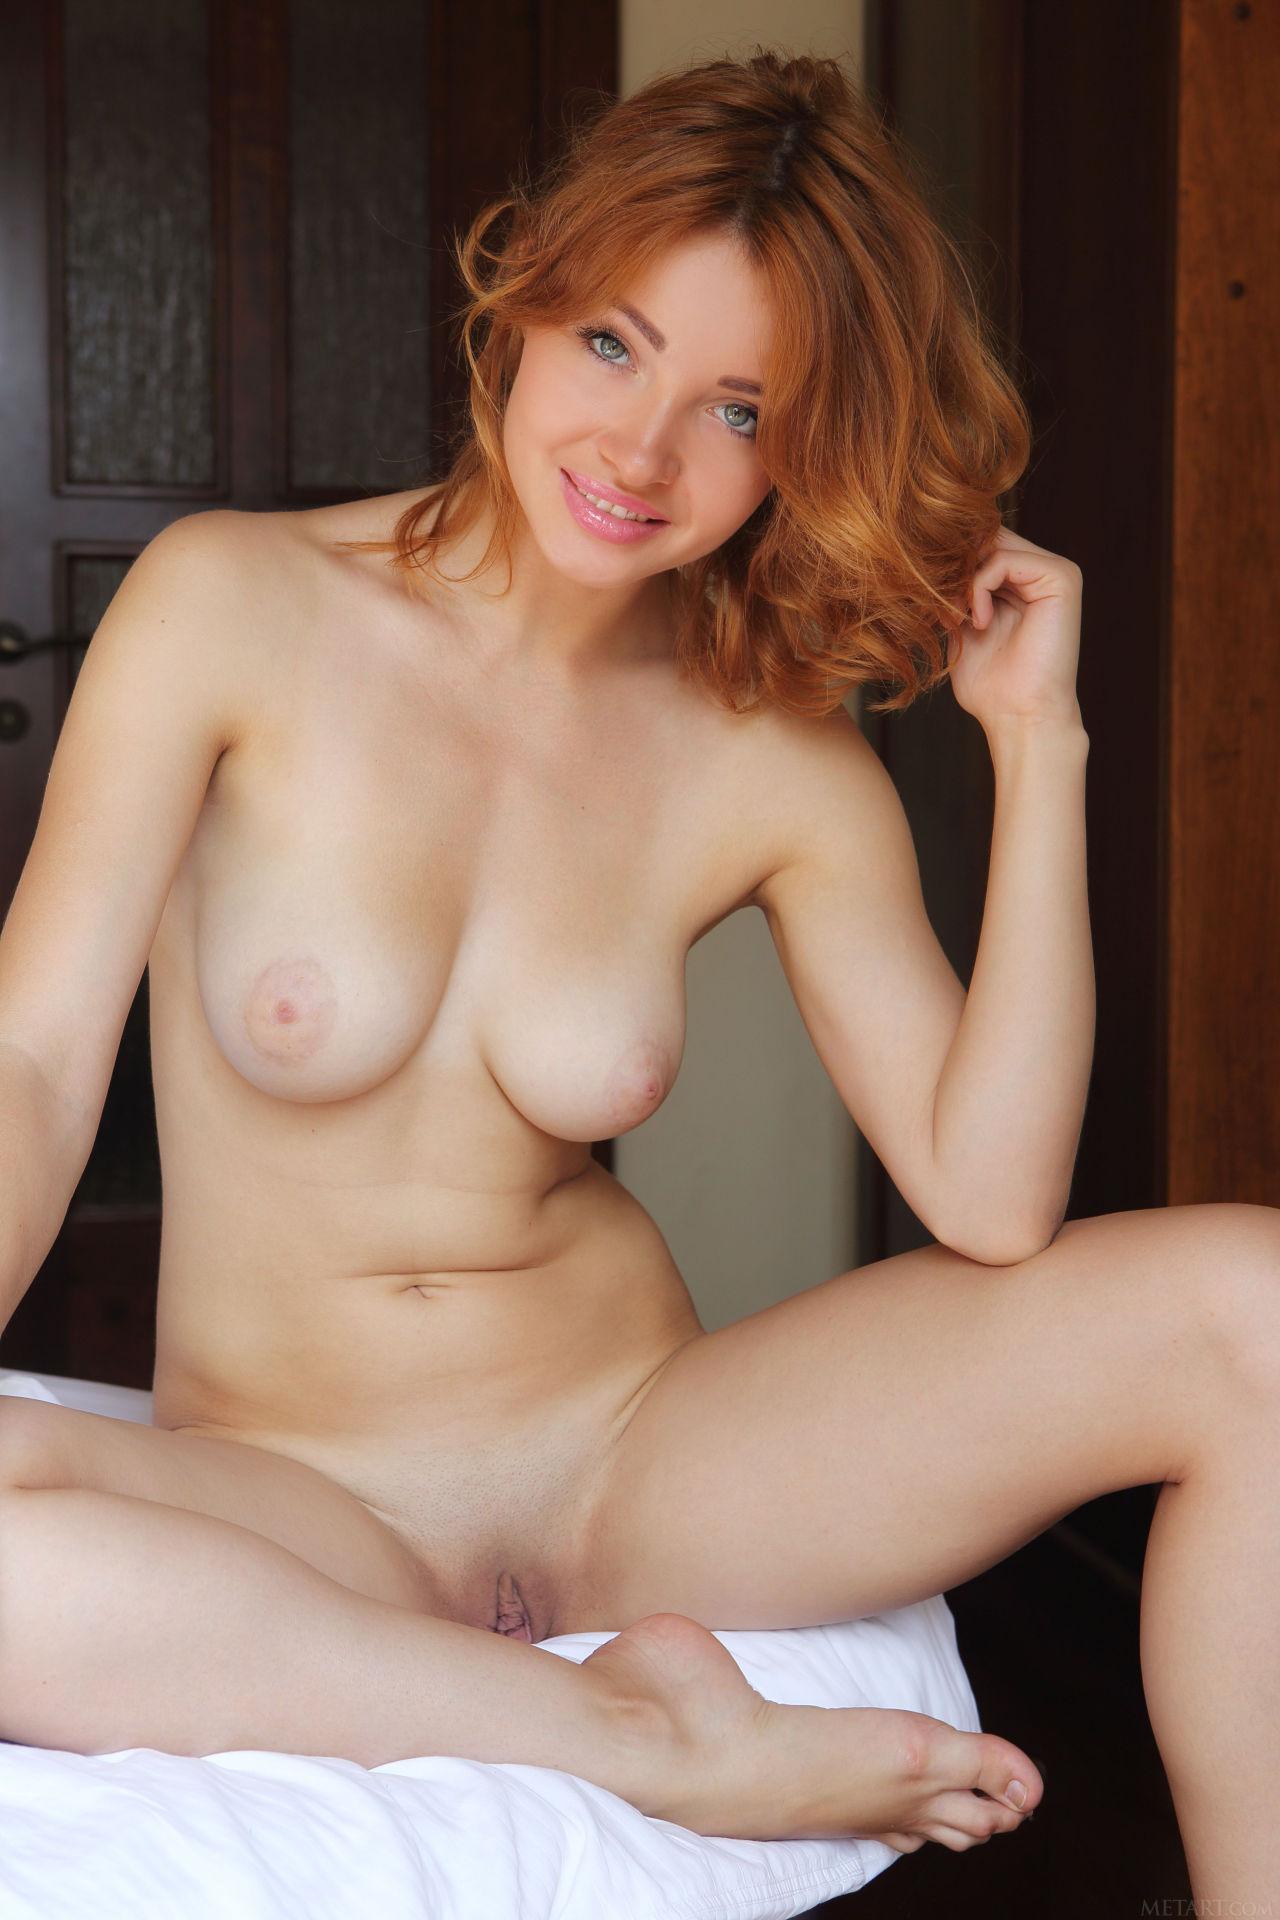 redhead compilation porn sexy redhead compilation sexy redhead compilation sexy redhead compilation sexy redhead